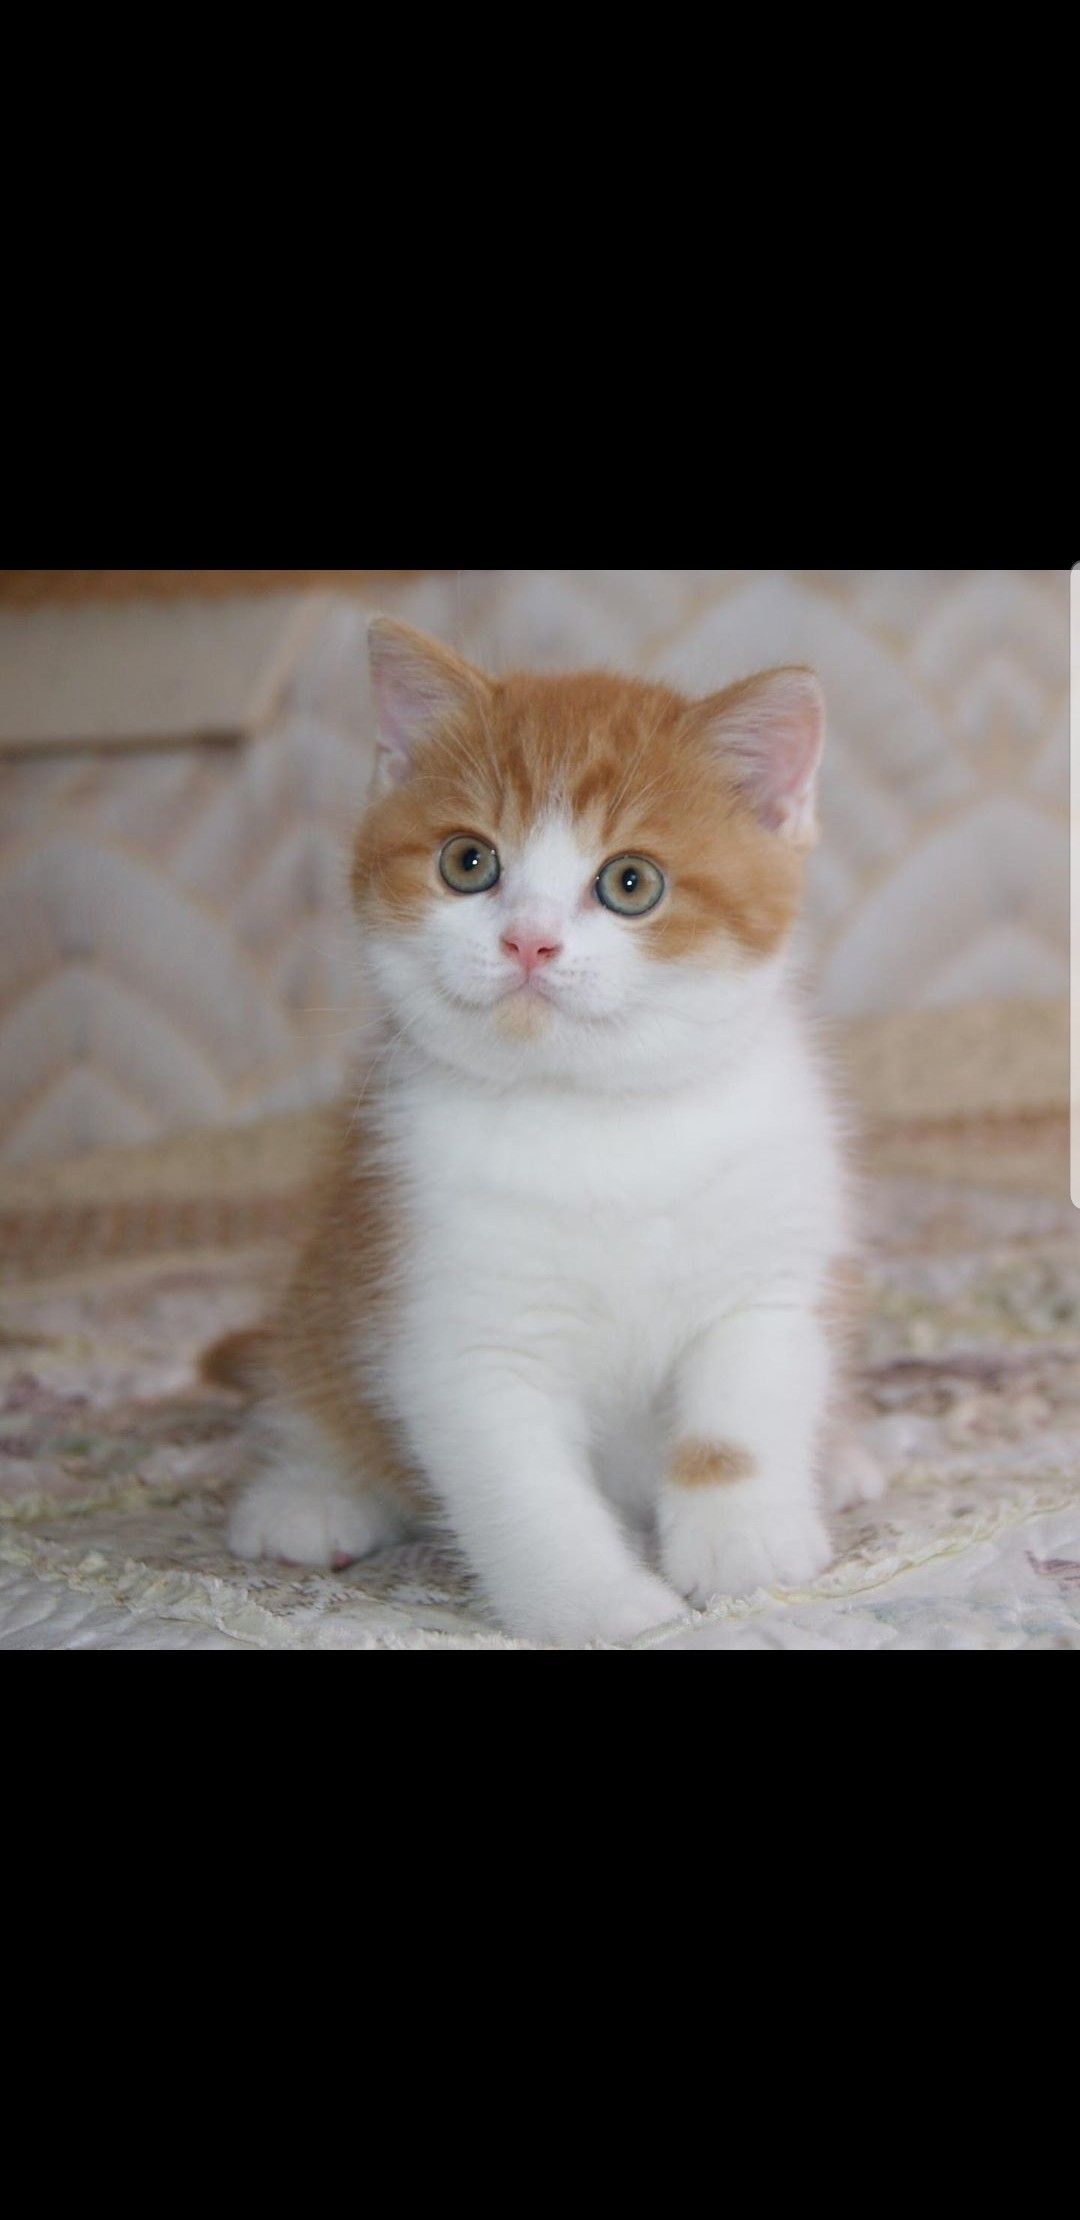 British Shorthair Kittens For Adoption British Shorthair Kittens For Sale Near Me British Shorthair Kittens Kitten Adoption British Shorthair